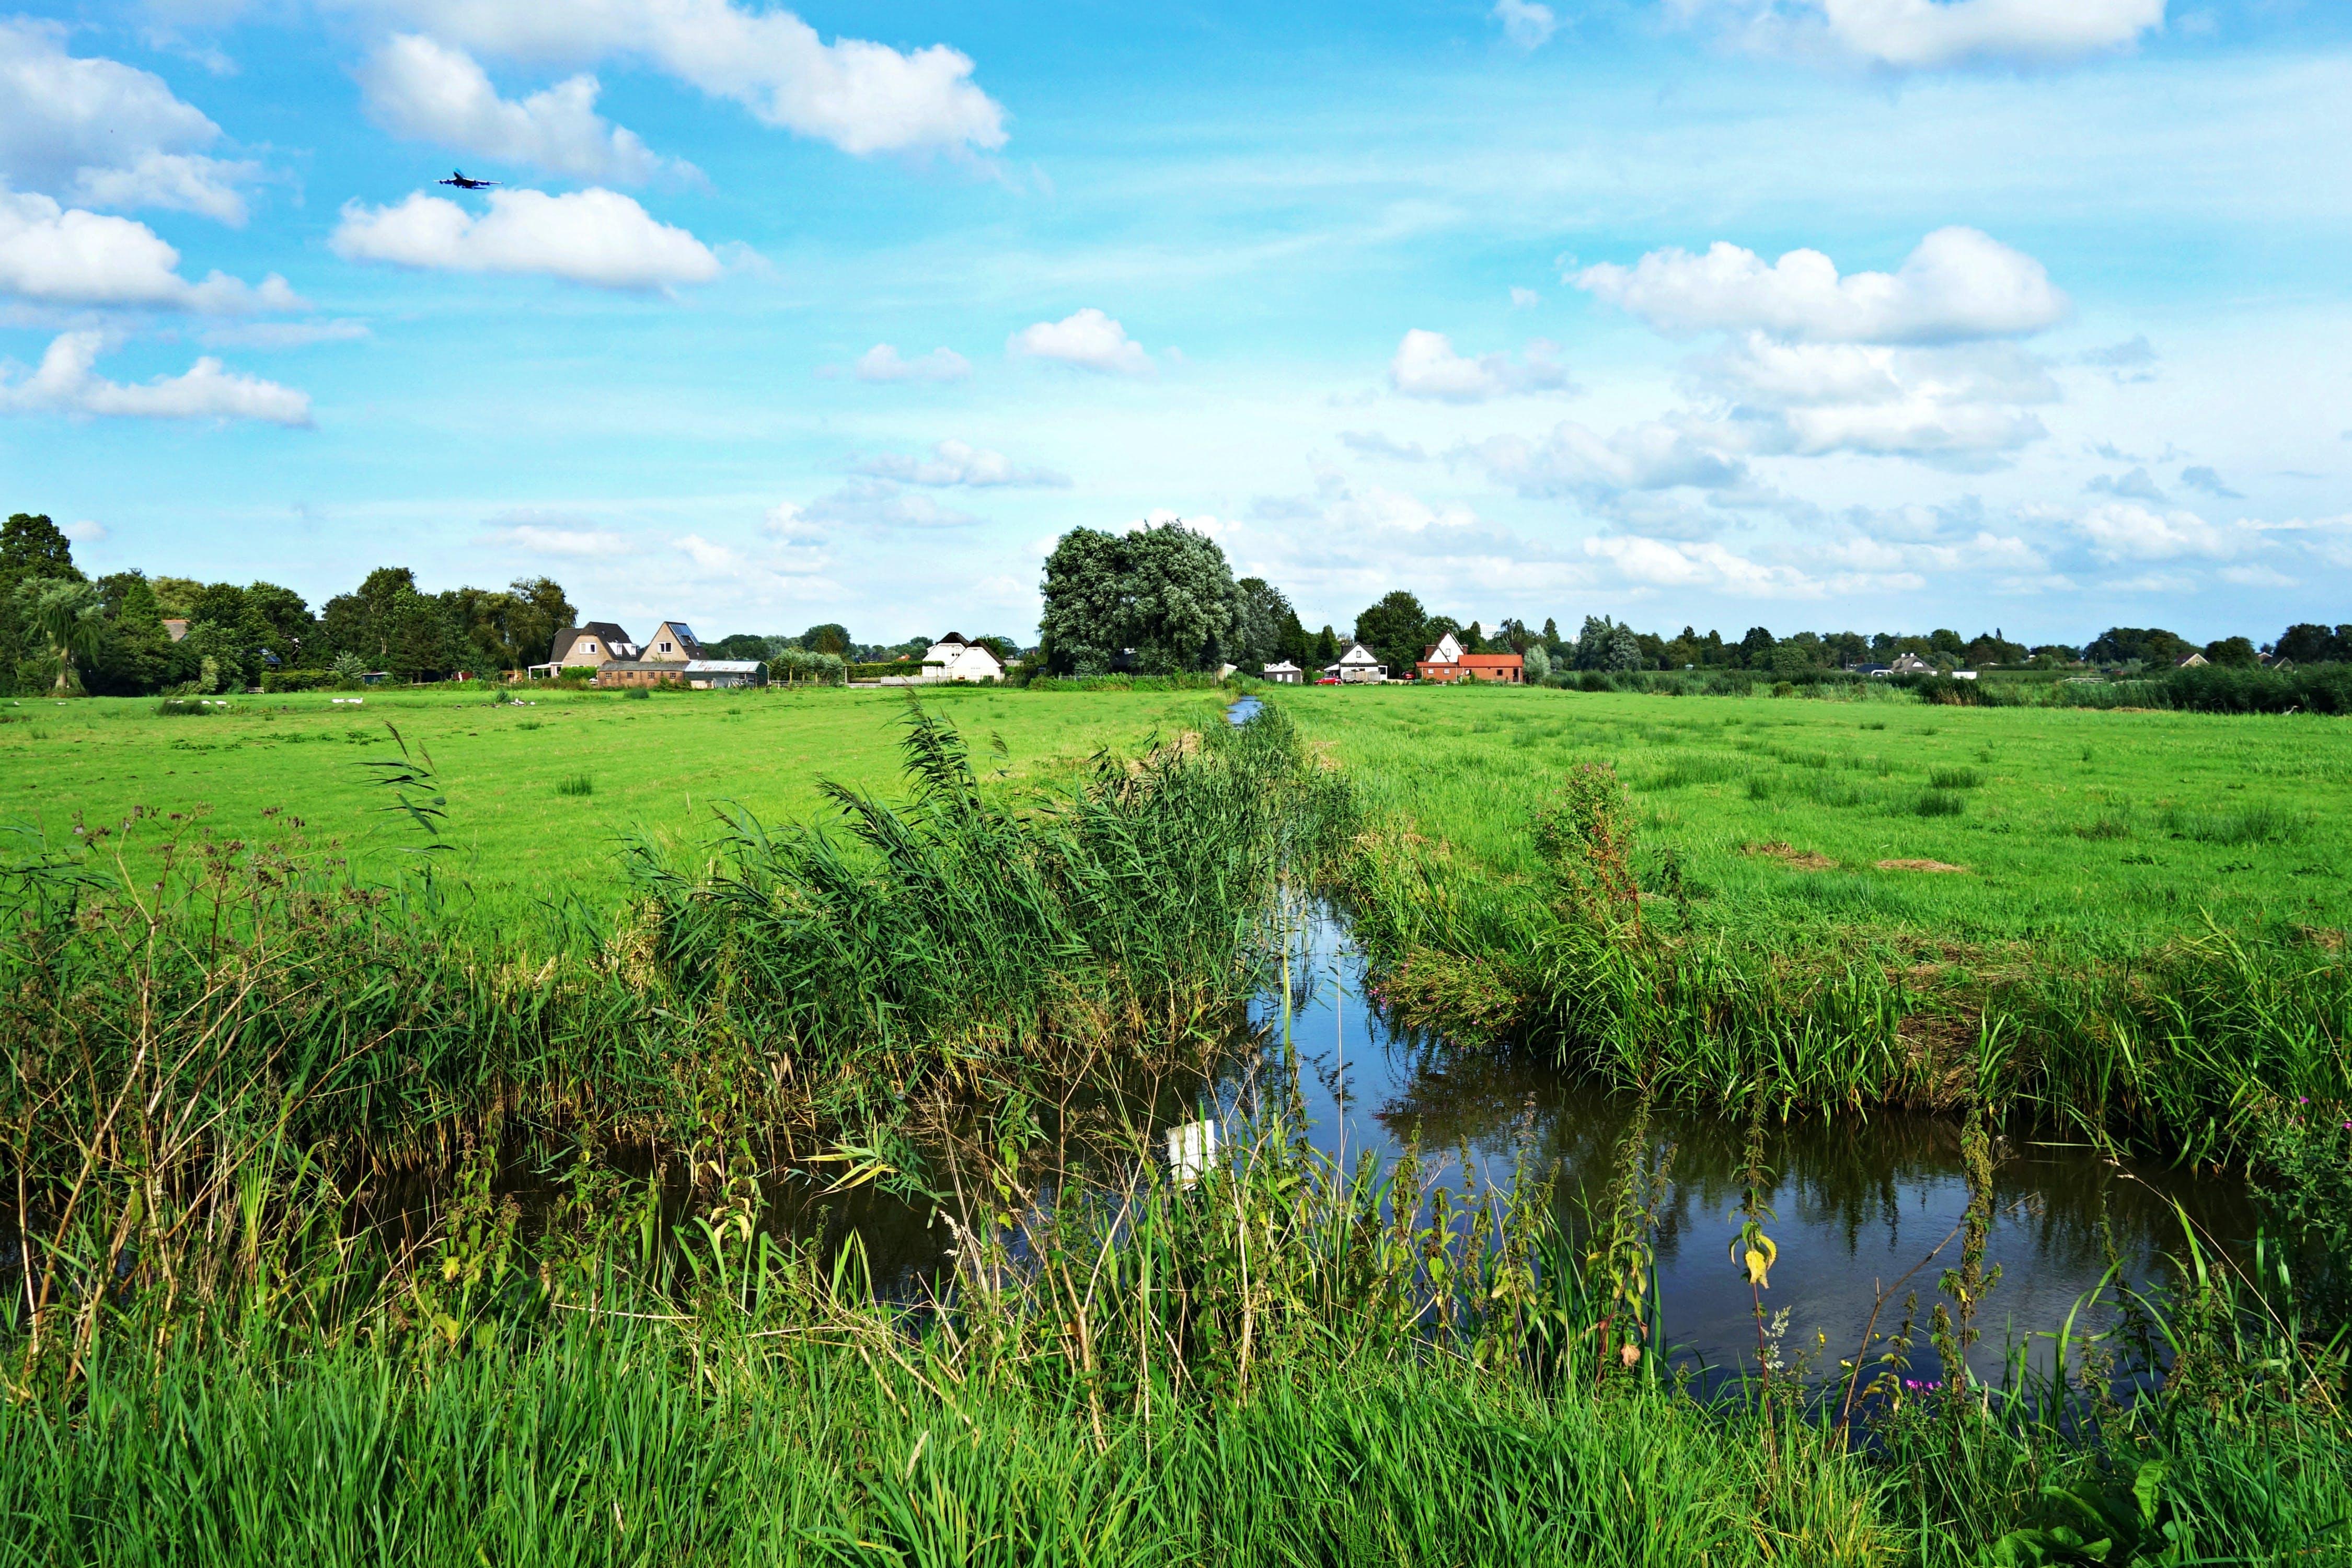 of amstelveen, countryside, ditch, Dutch landscape